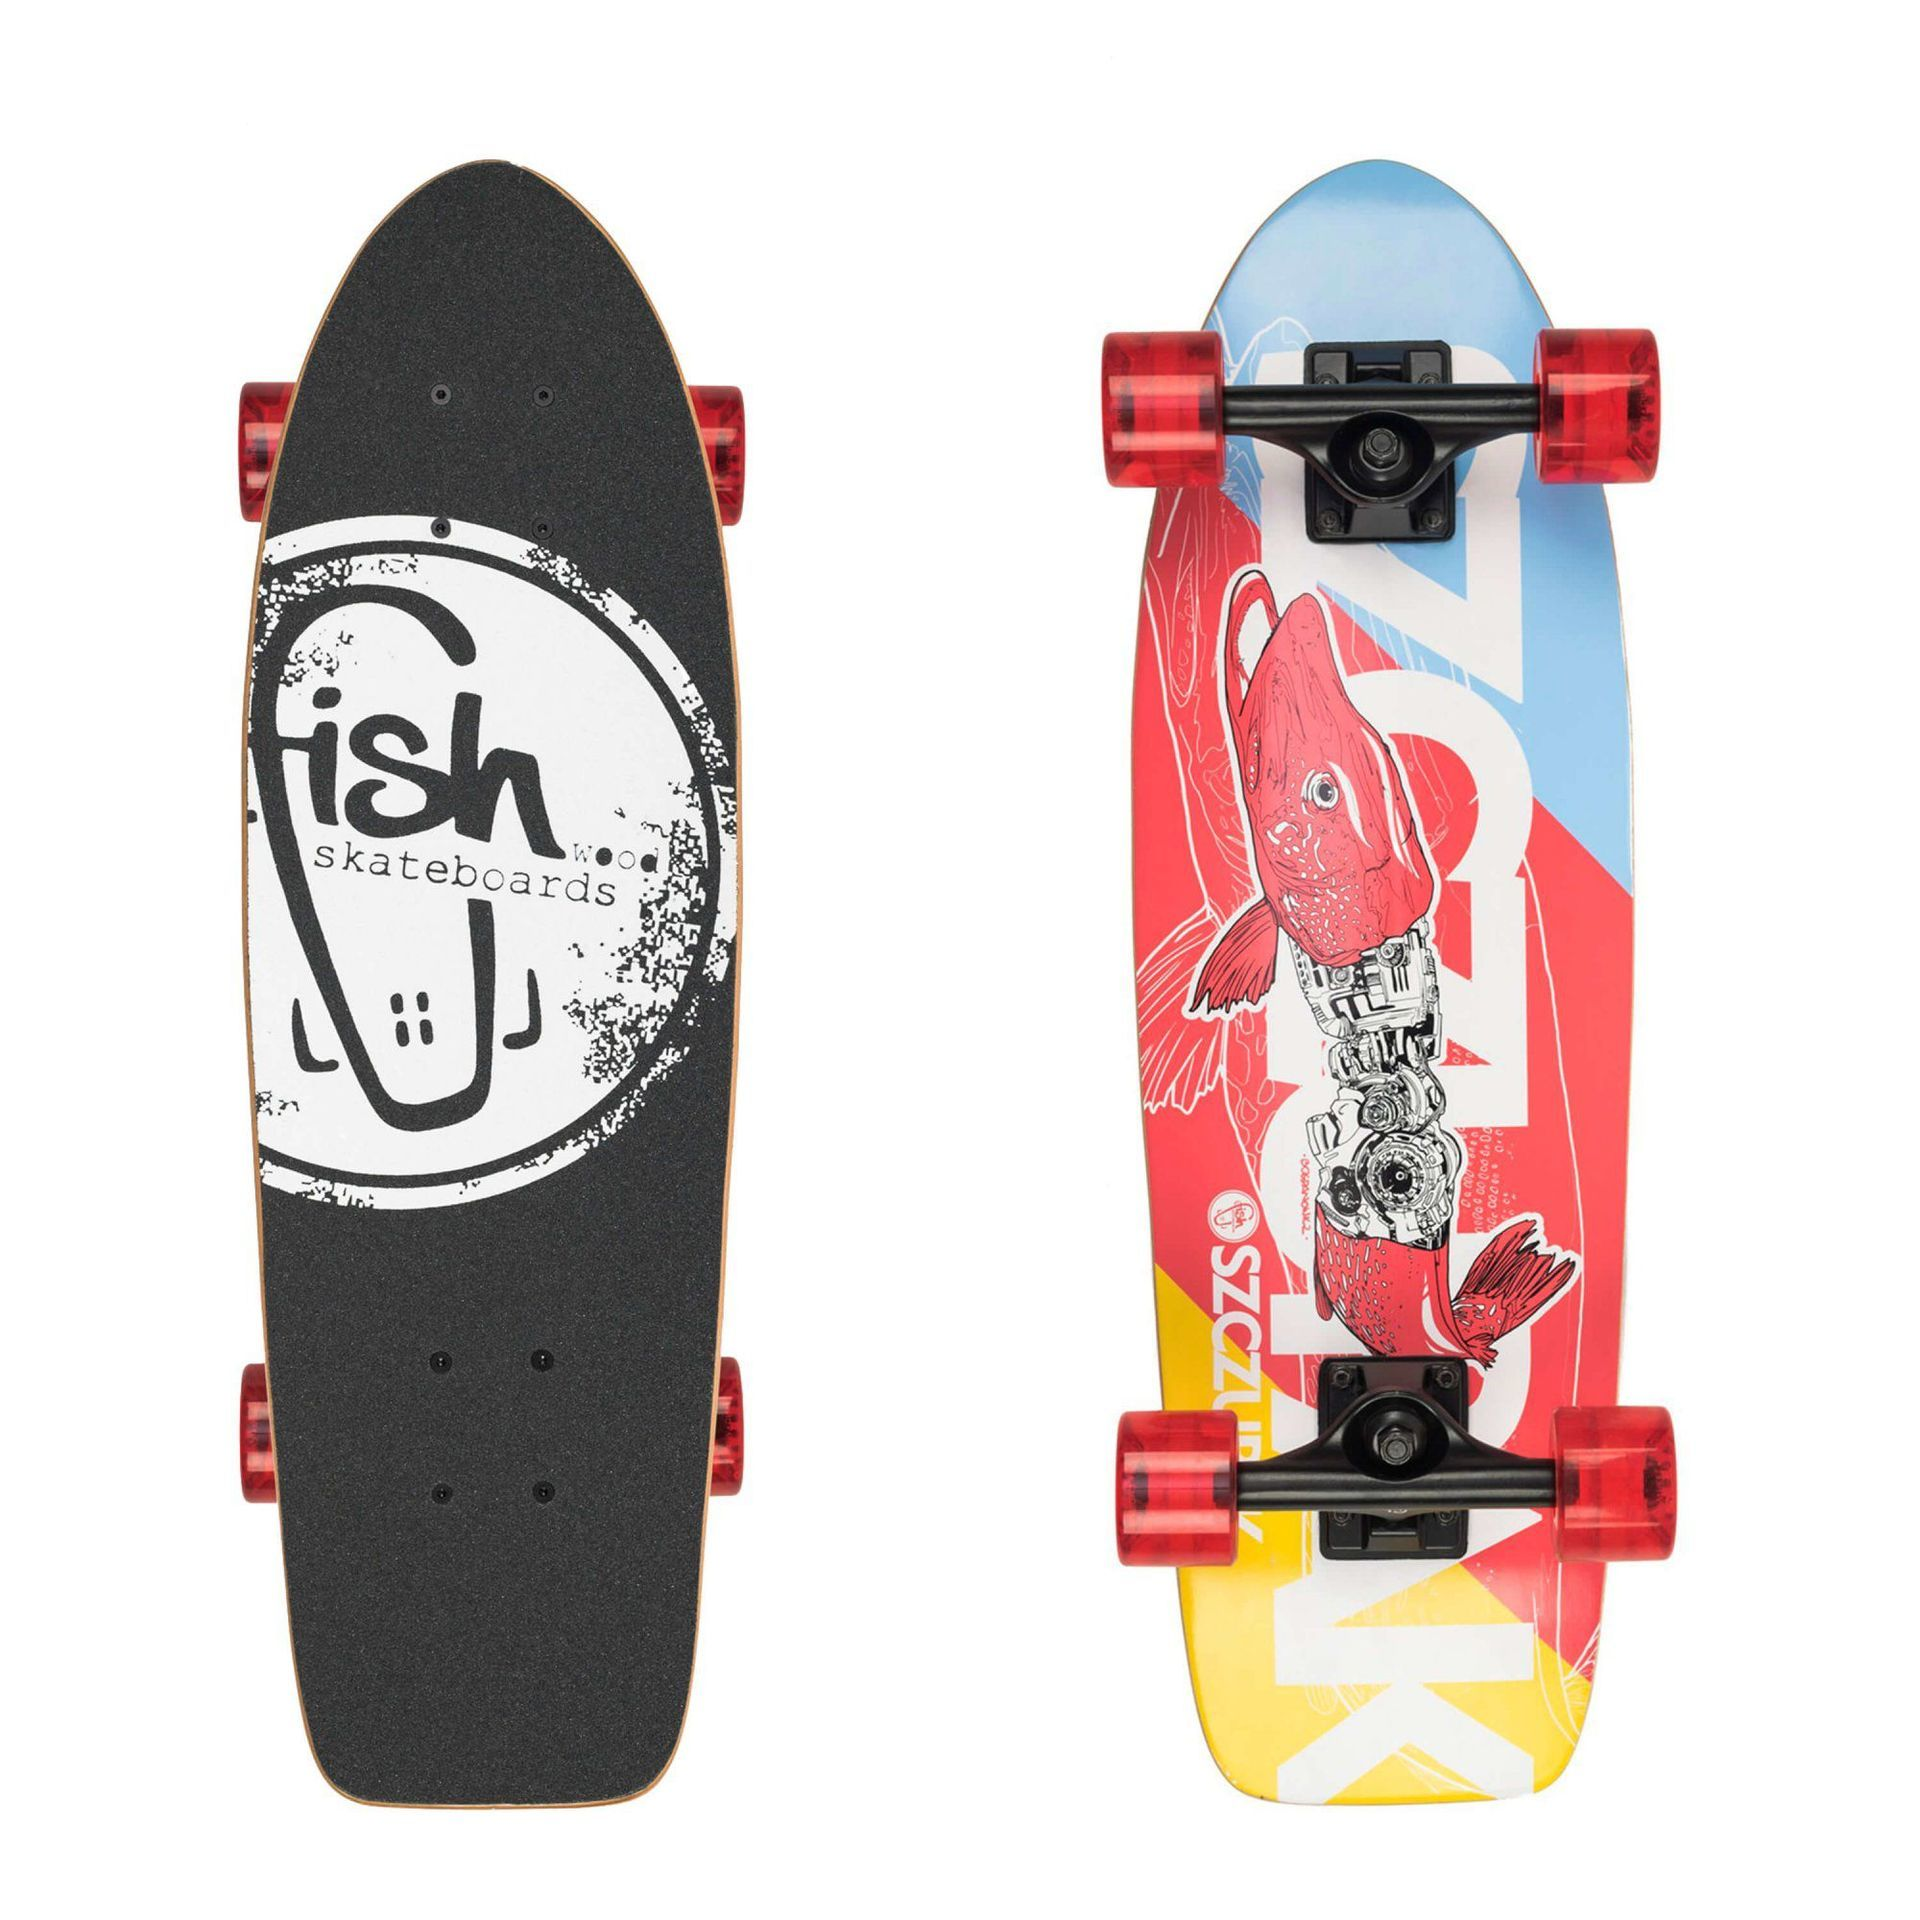 FISHBOARD FISH SKATEBOARDS CRUISER 26 SZCZUPAK|BLACK|TRANSPARENT RED 1